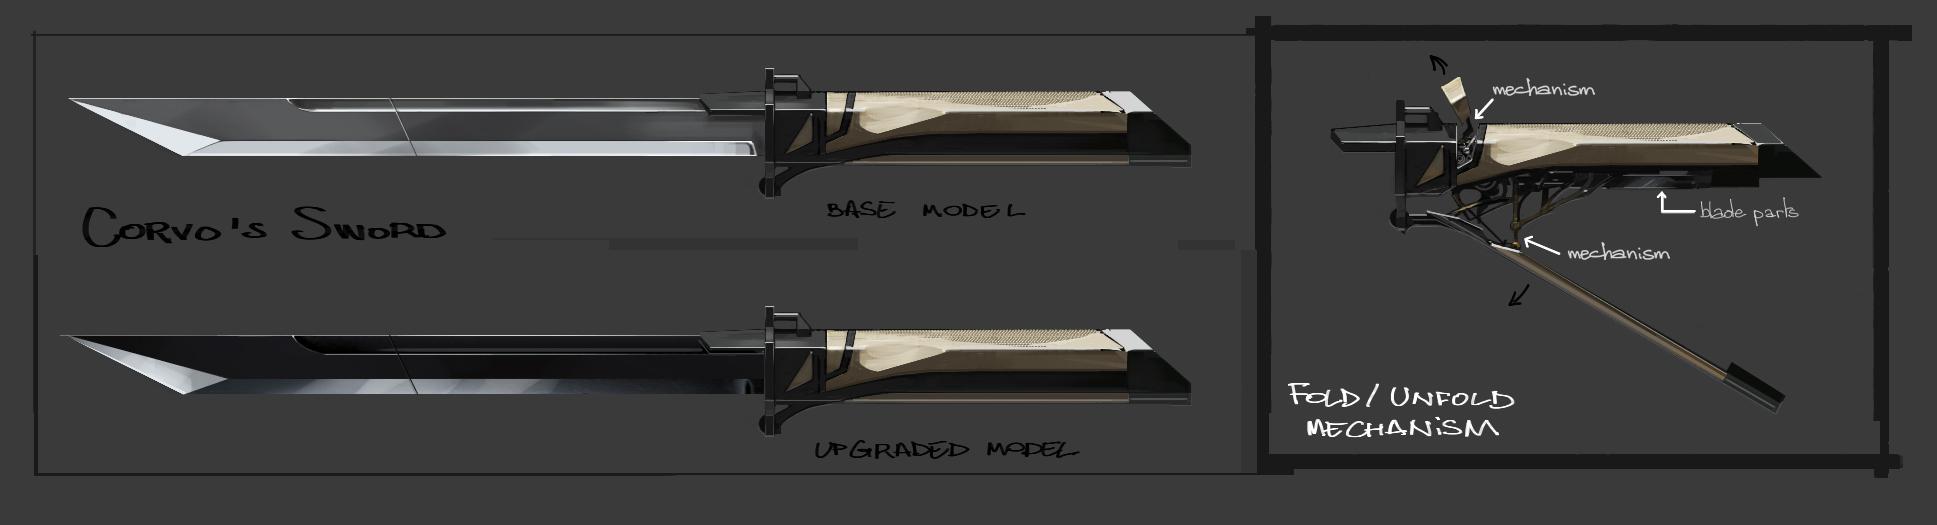 Corvo s sword design.jpg